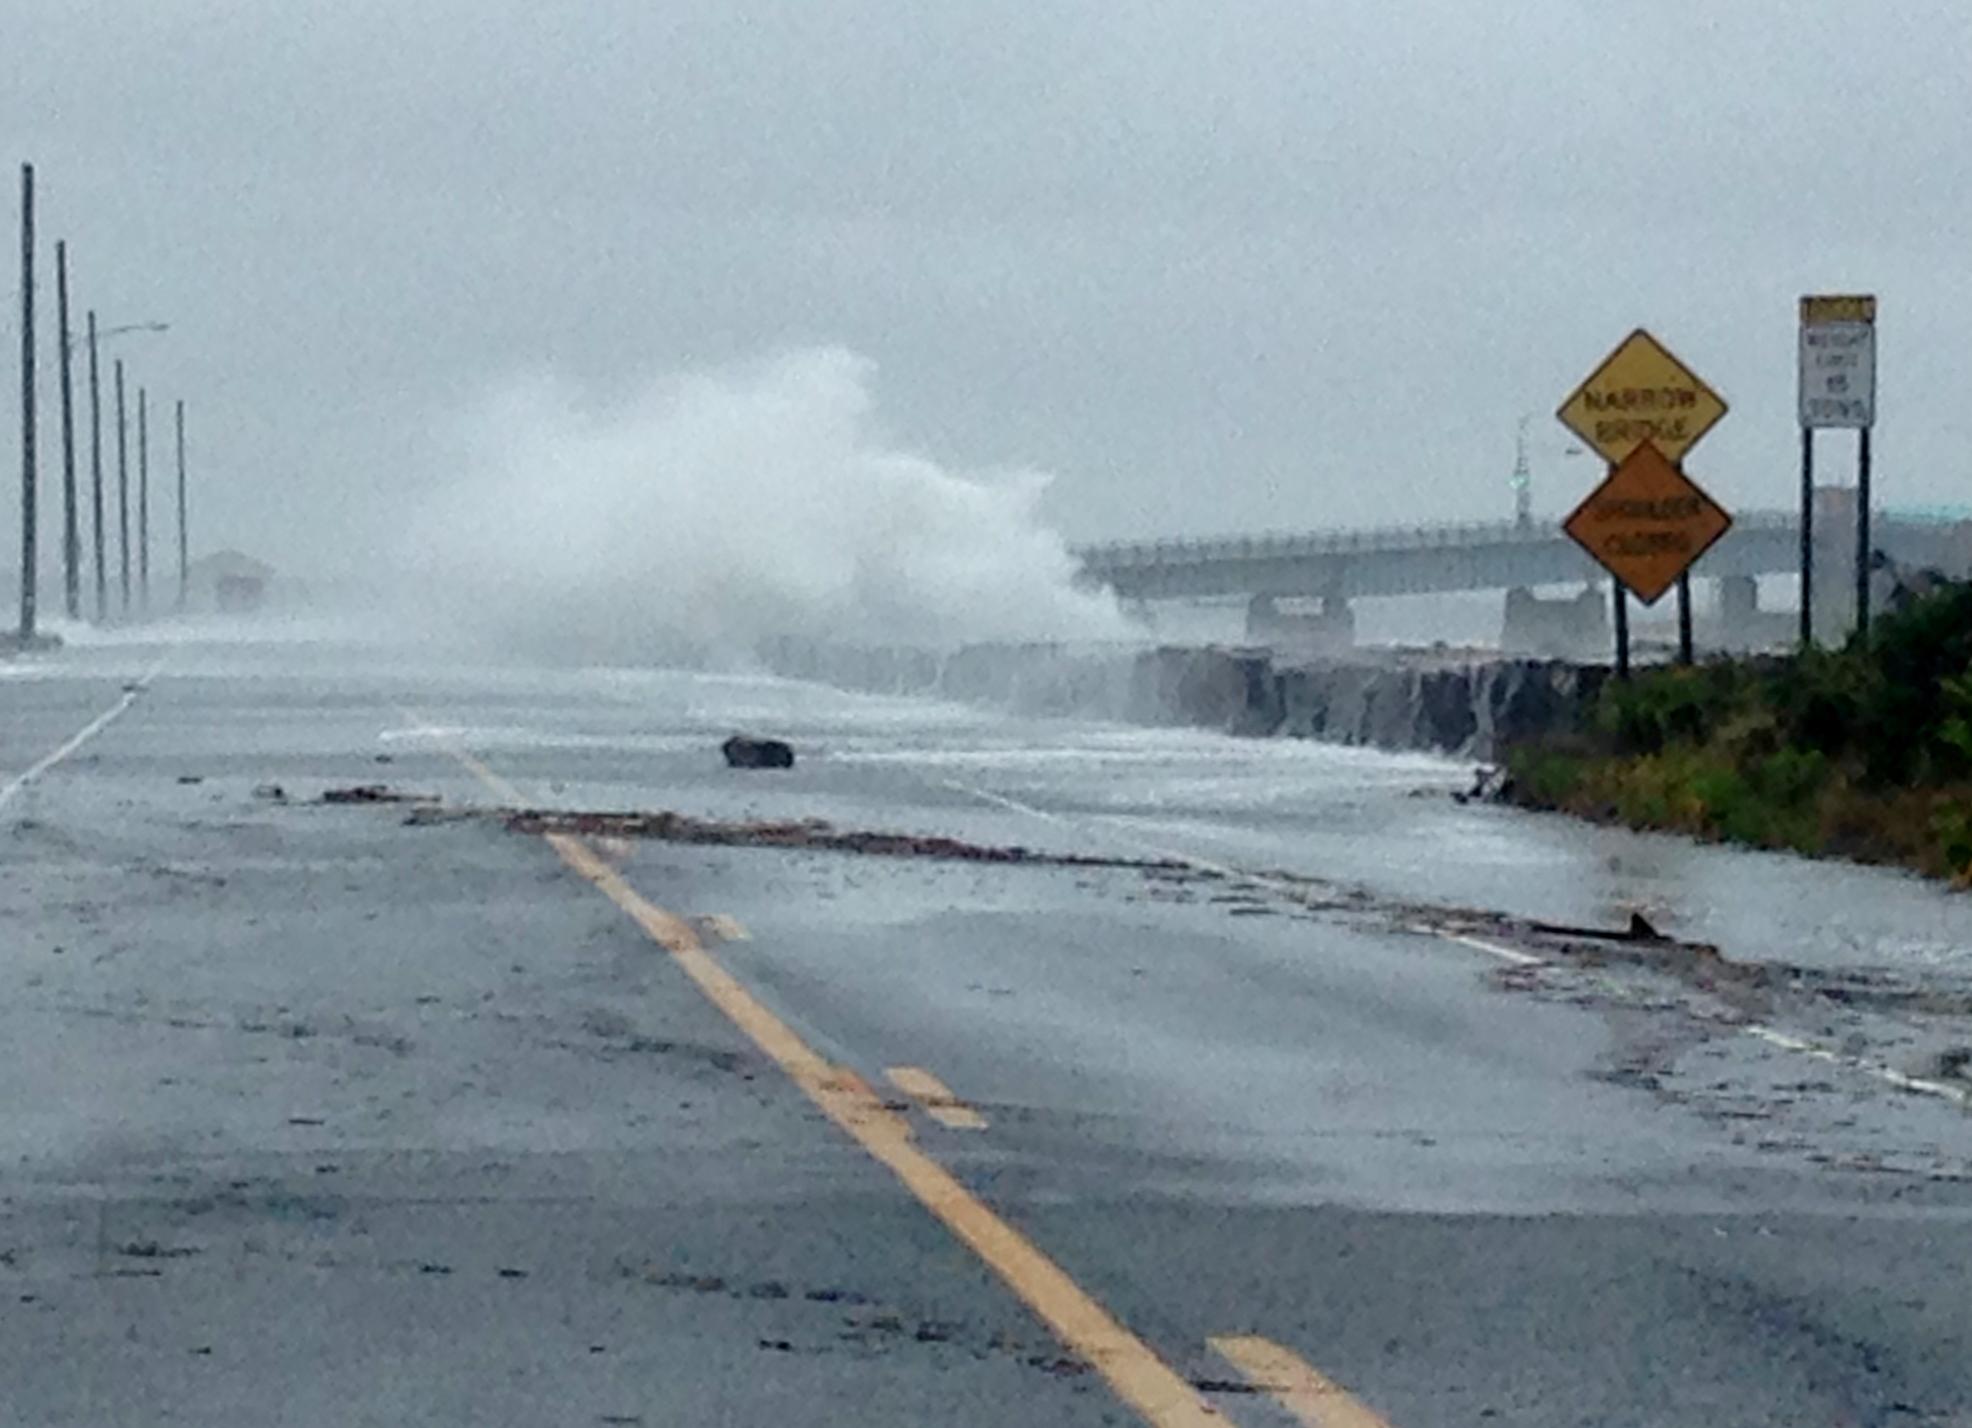 Friday, October 2nd, 3:10pm: Coastal Flood Warning ...